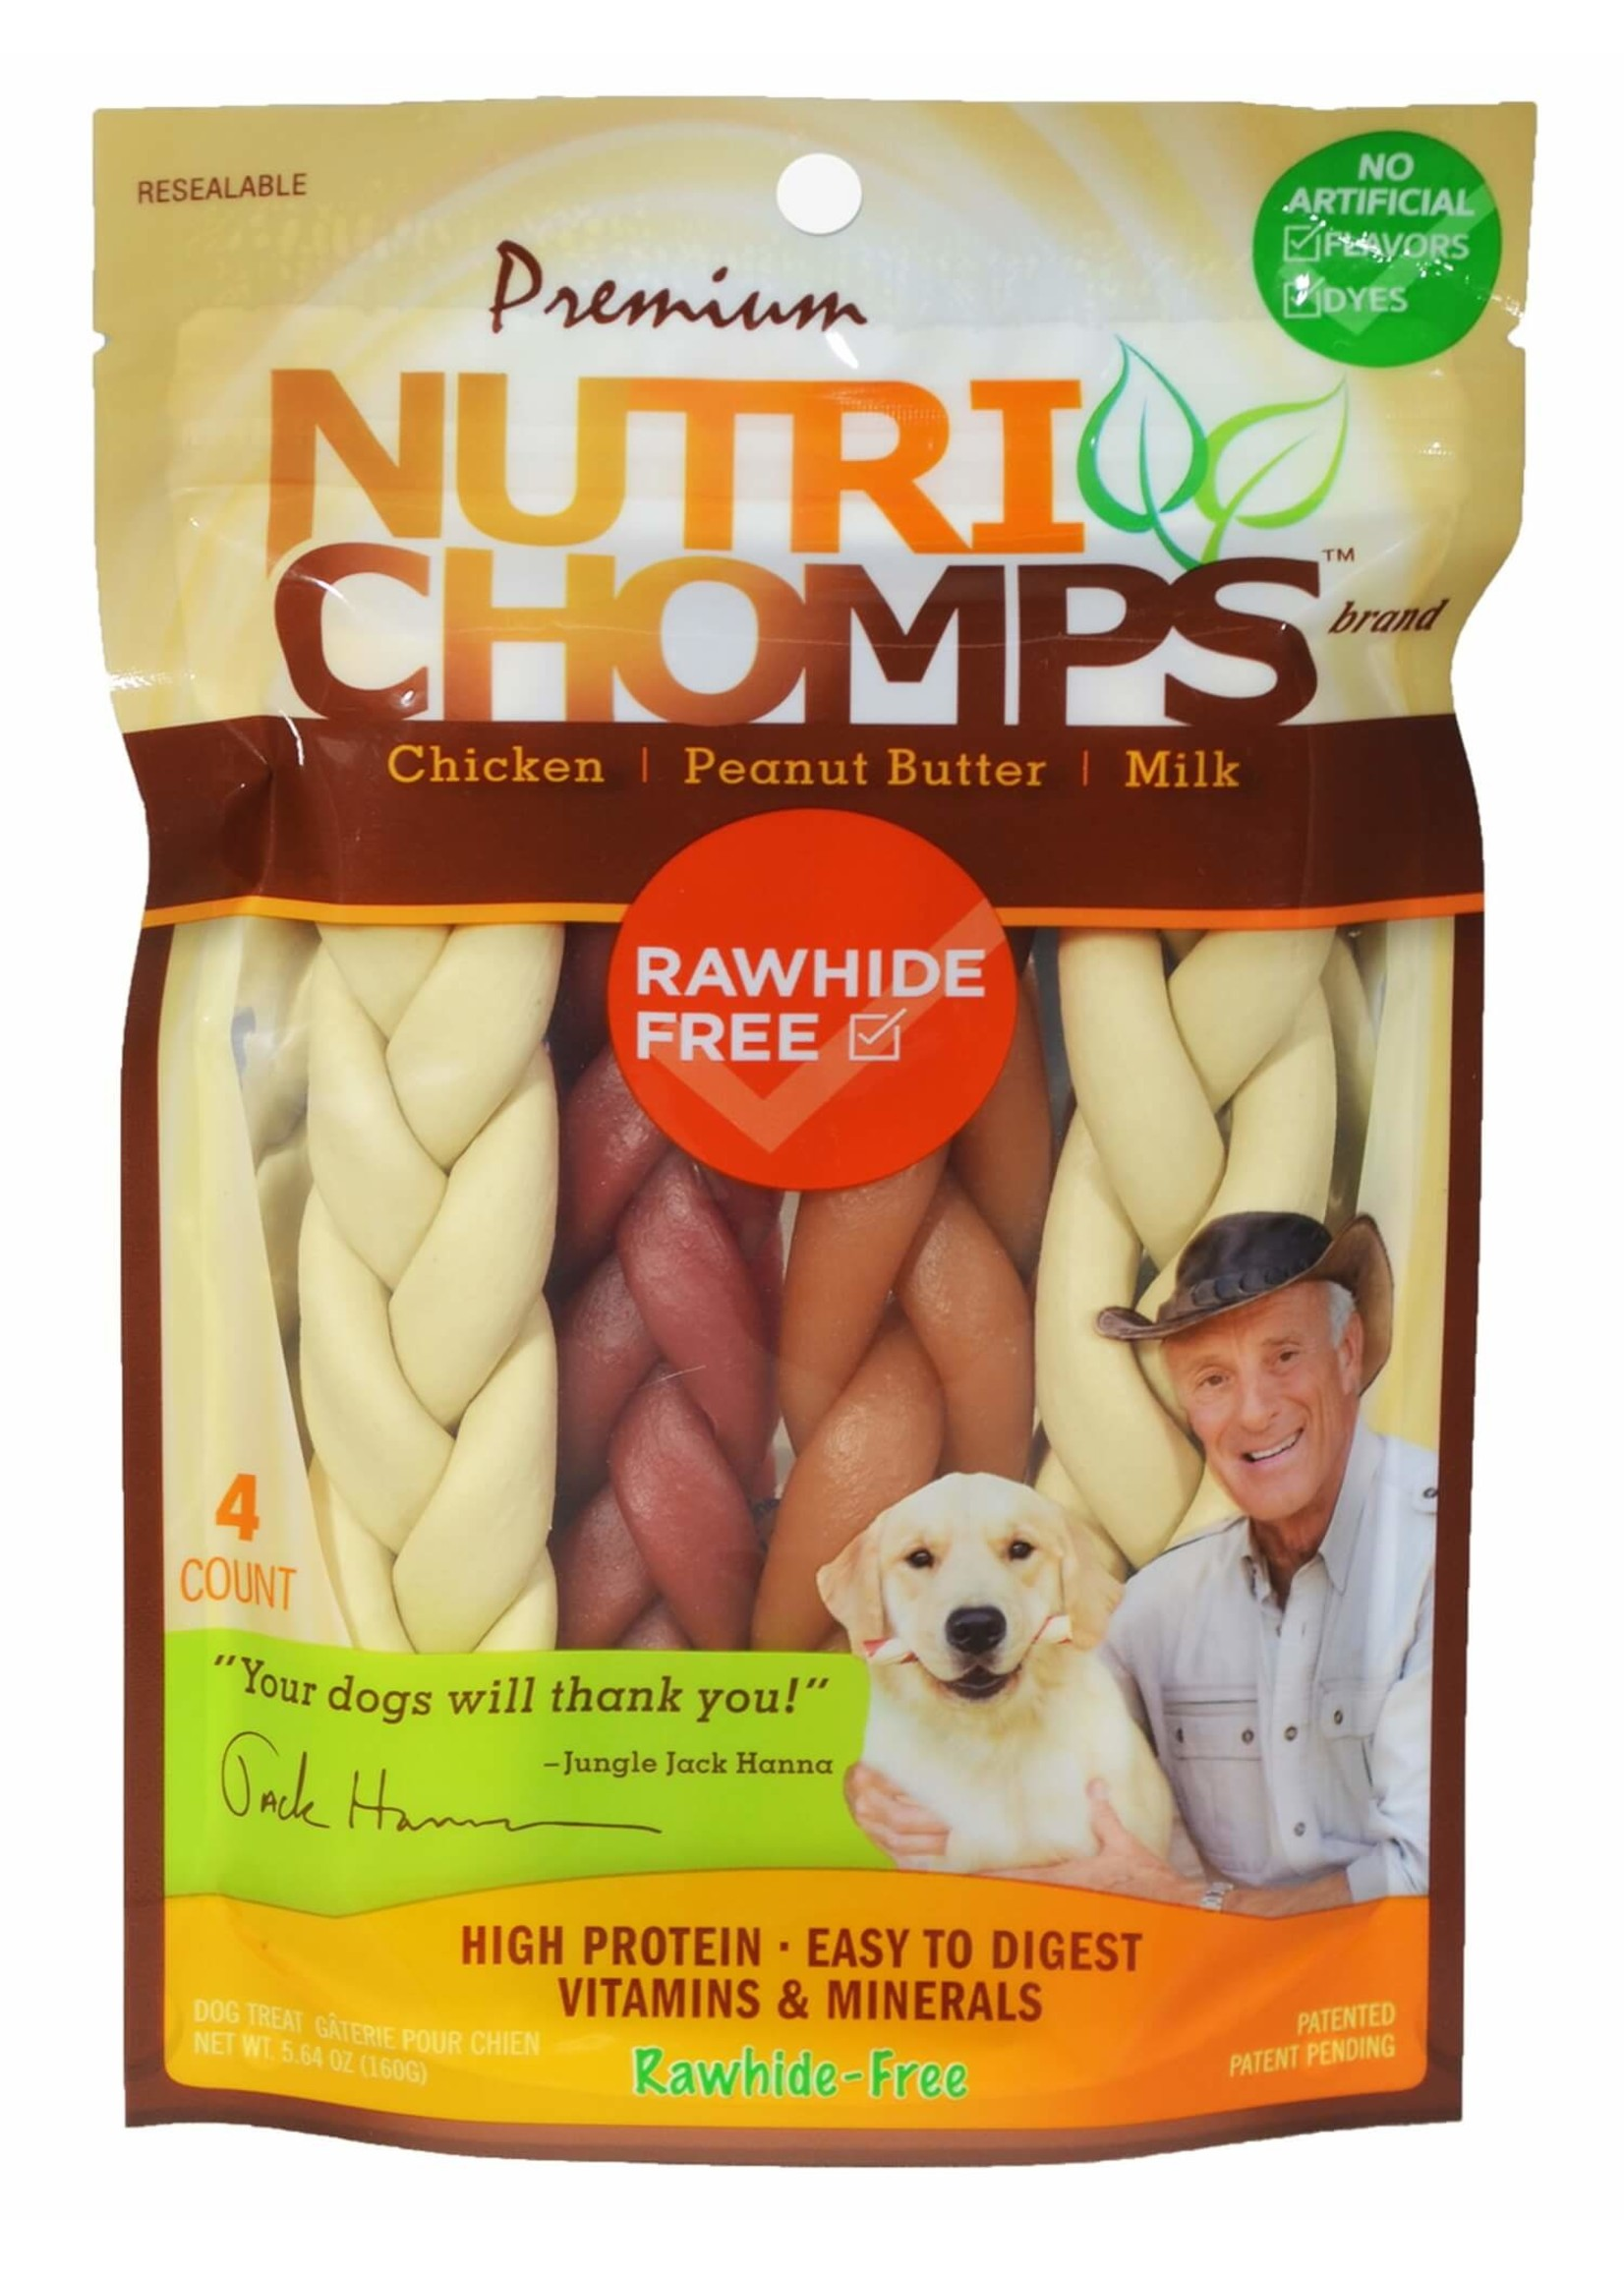 Nutri Chomps Nutri Chomps Assorted 6'' Braids 4 ct